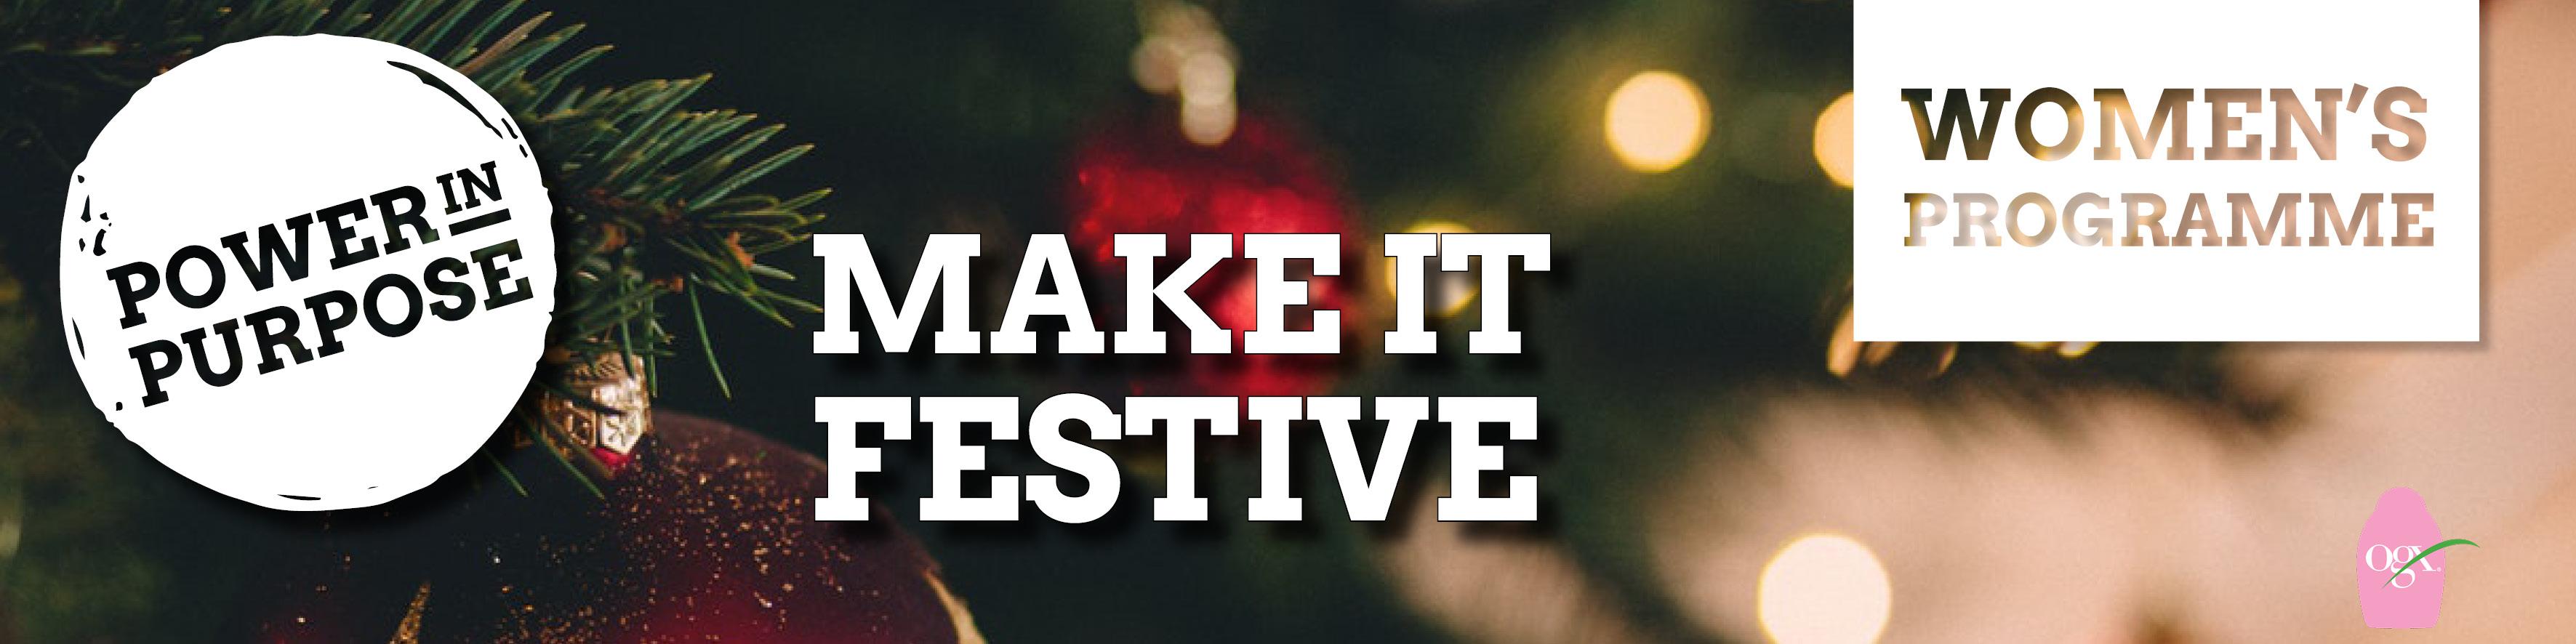 Make it Festive